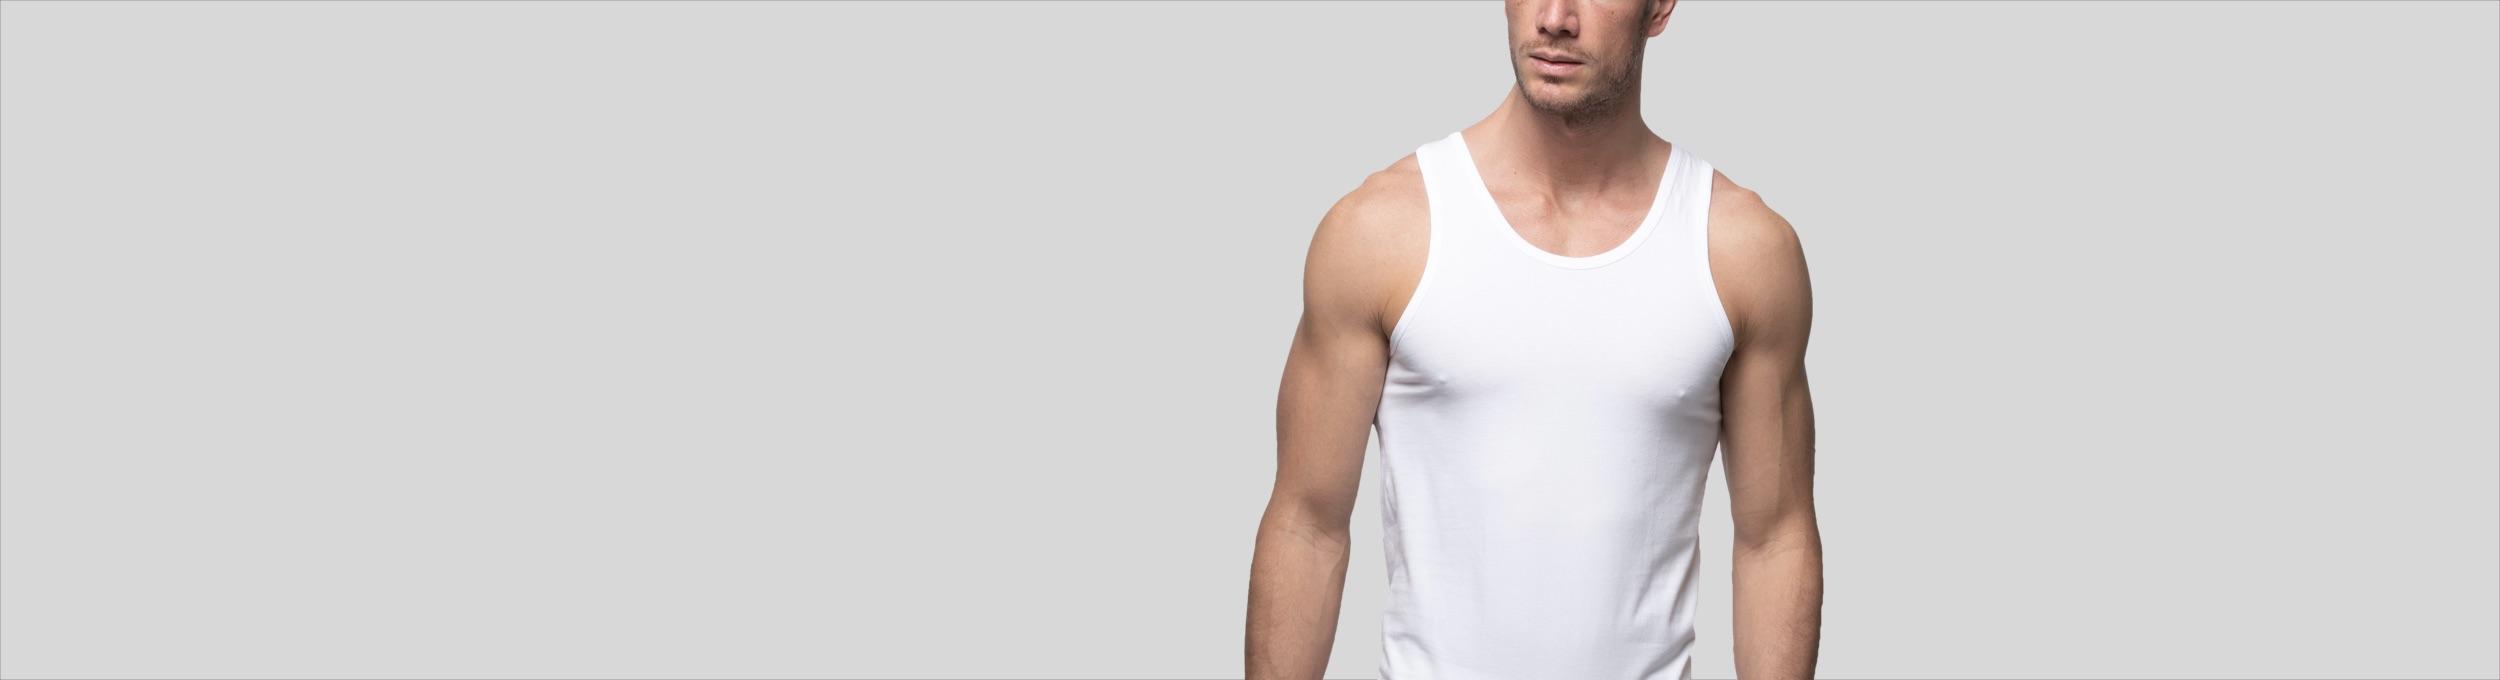 Camiseta interior de tirantes para hombre Abanderado